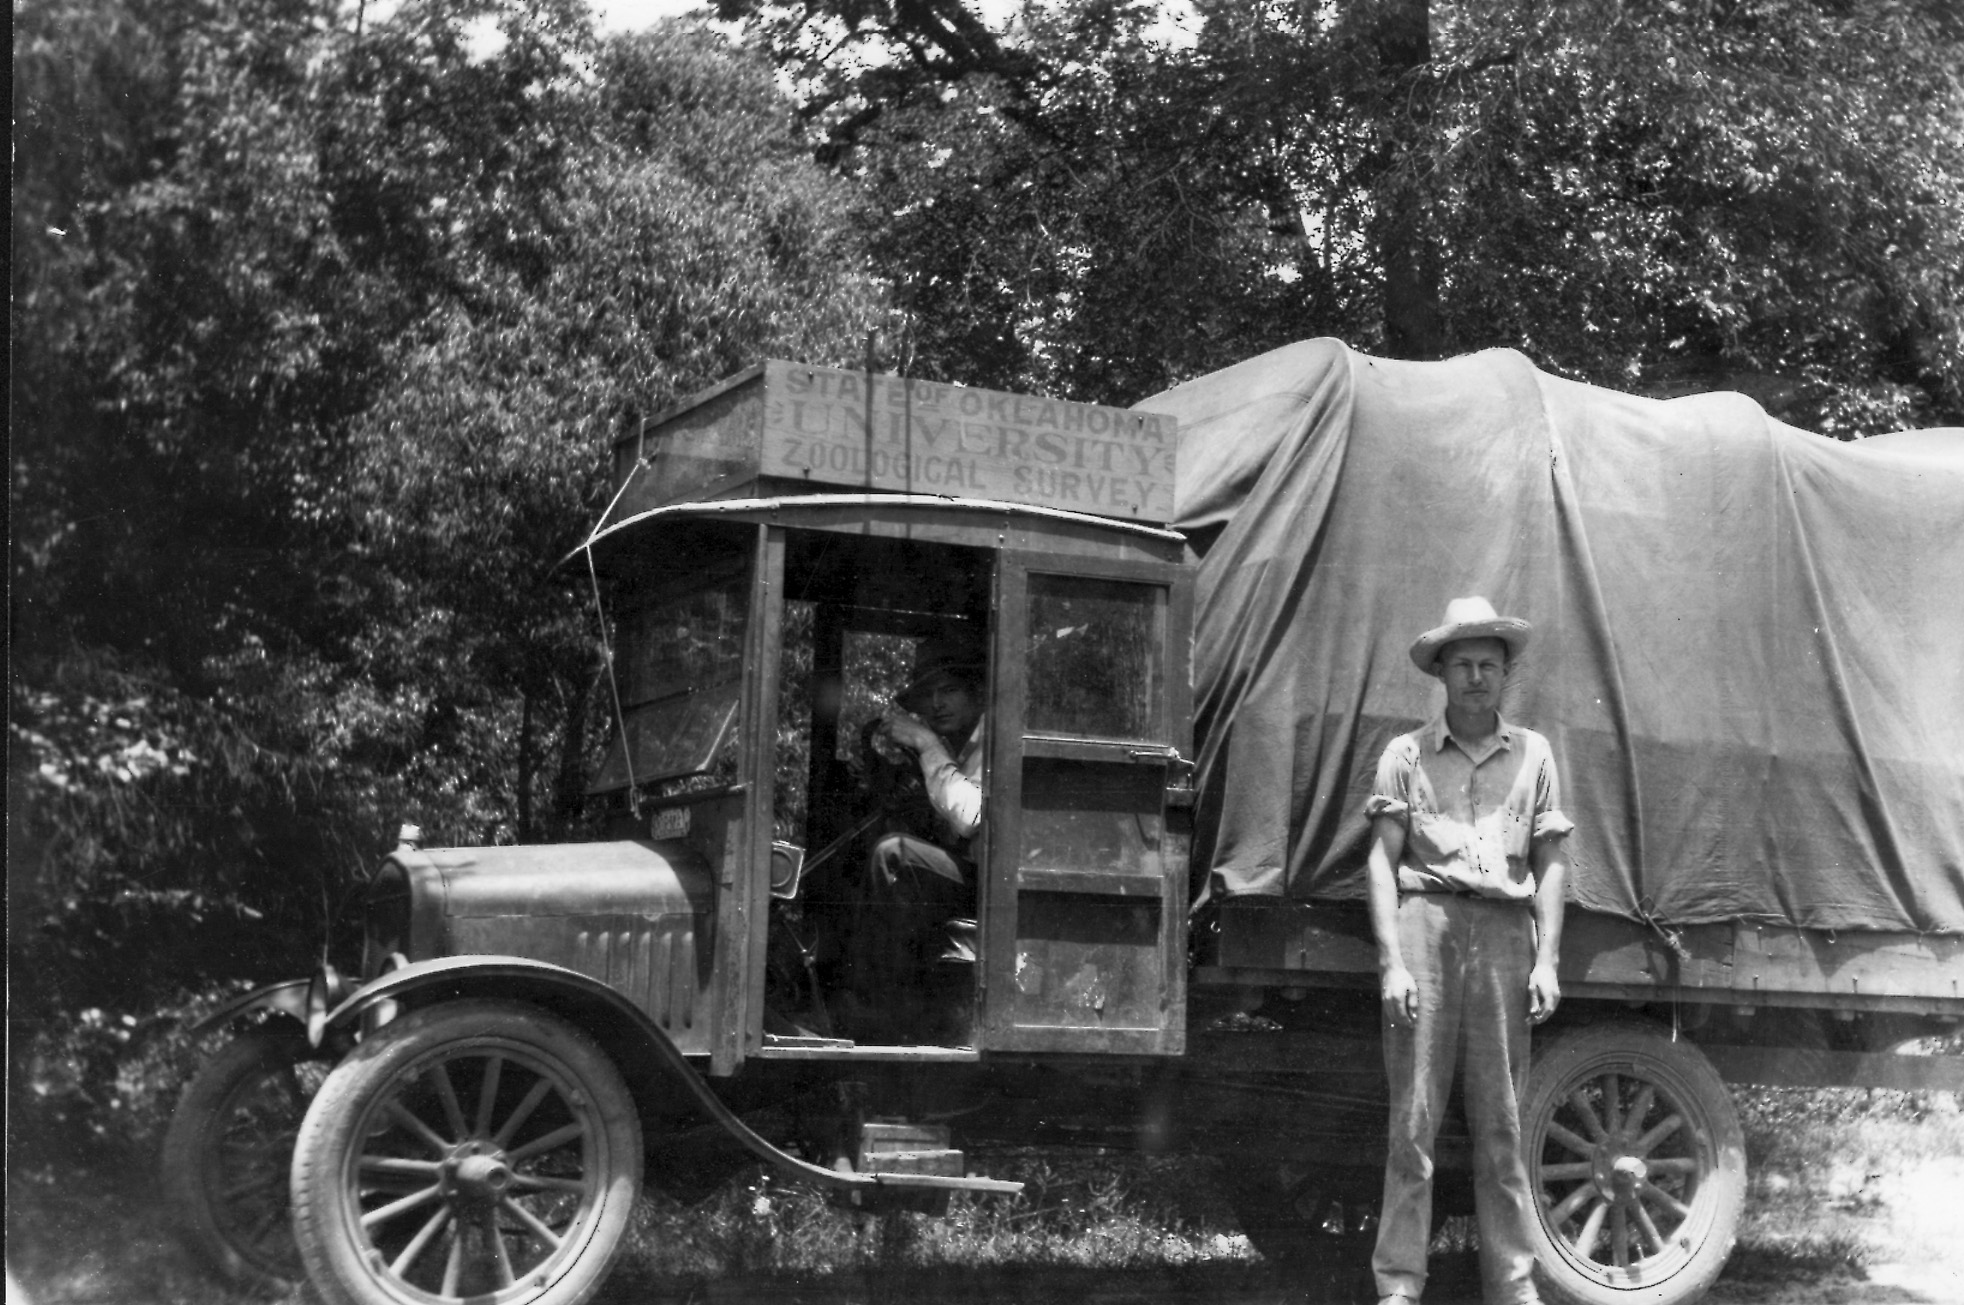 Ortenburger expedition, 1920's.